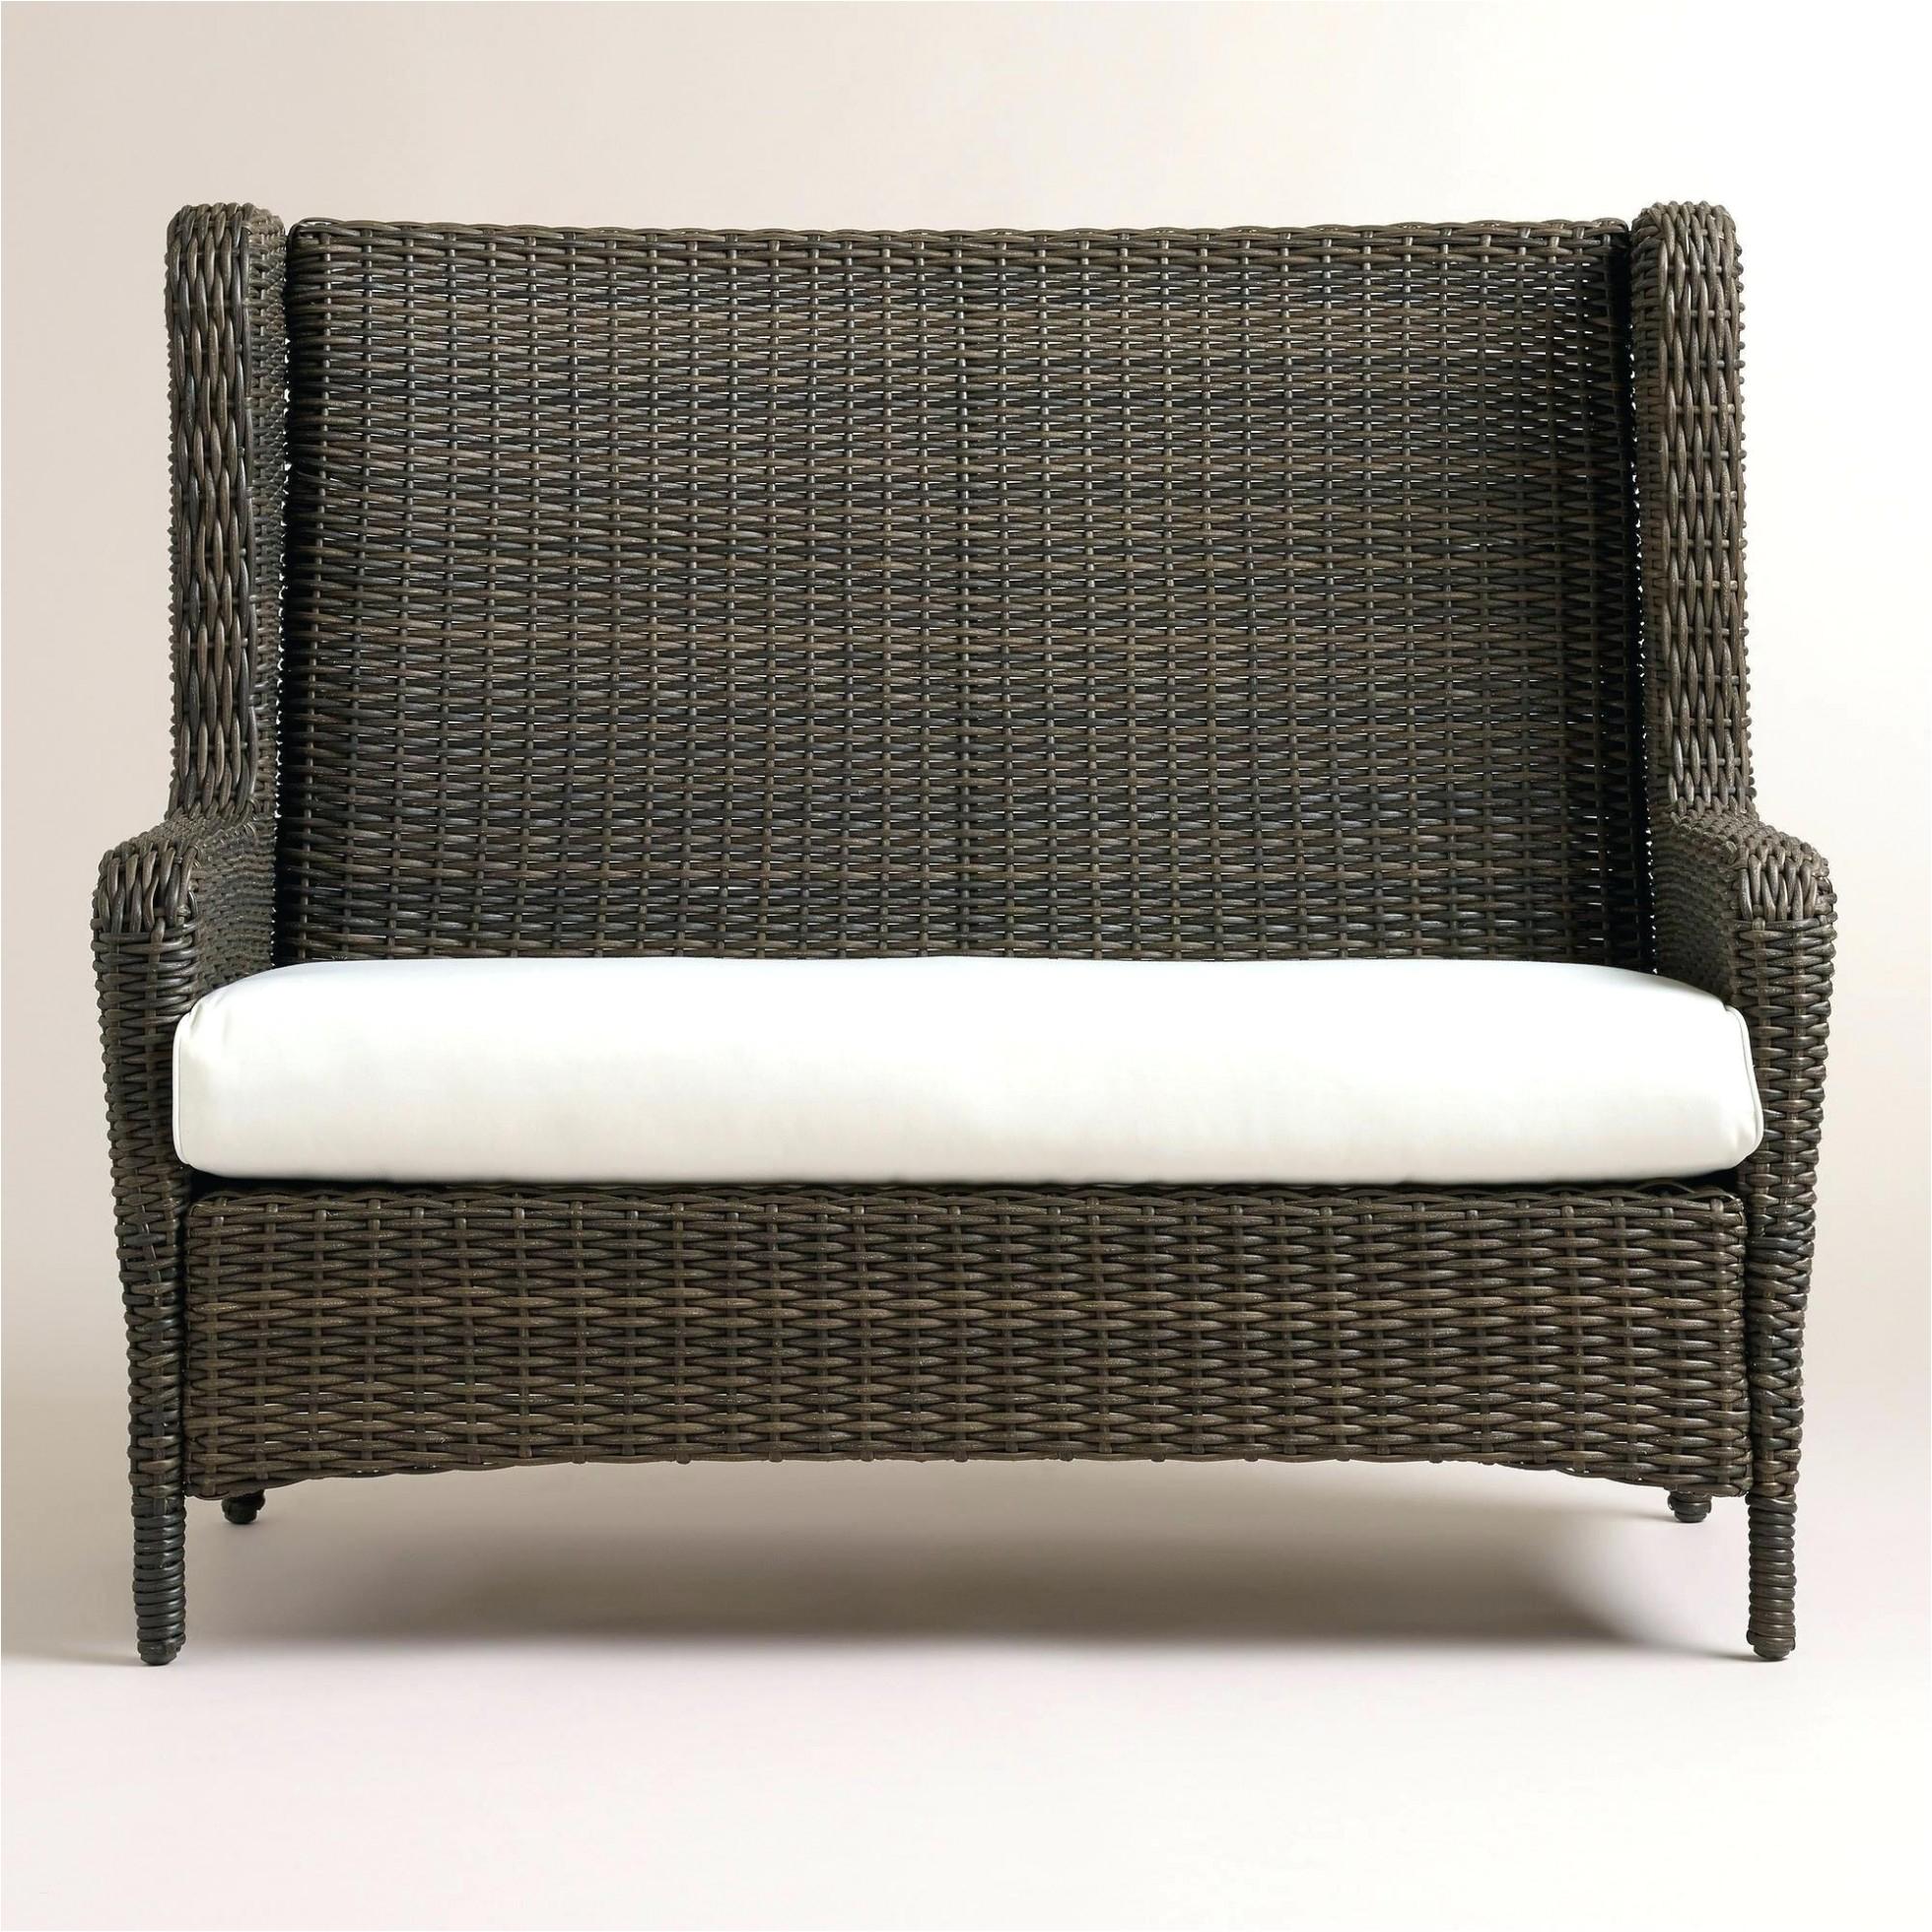 12 jcp outdoor furniture photos